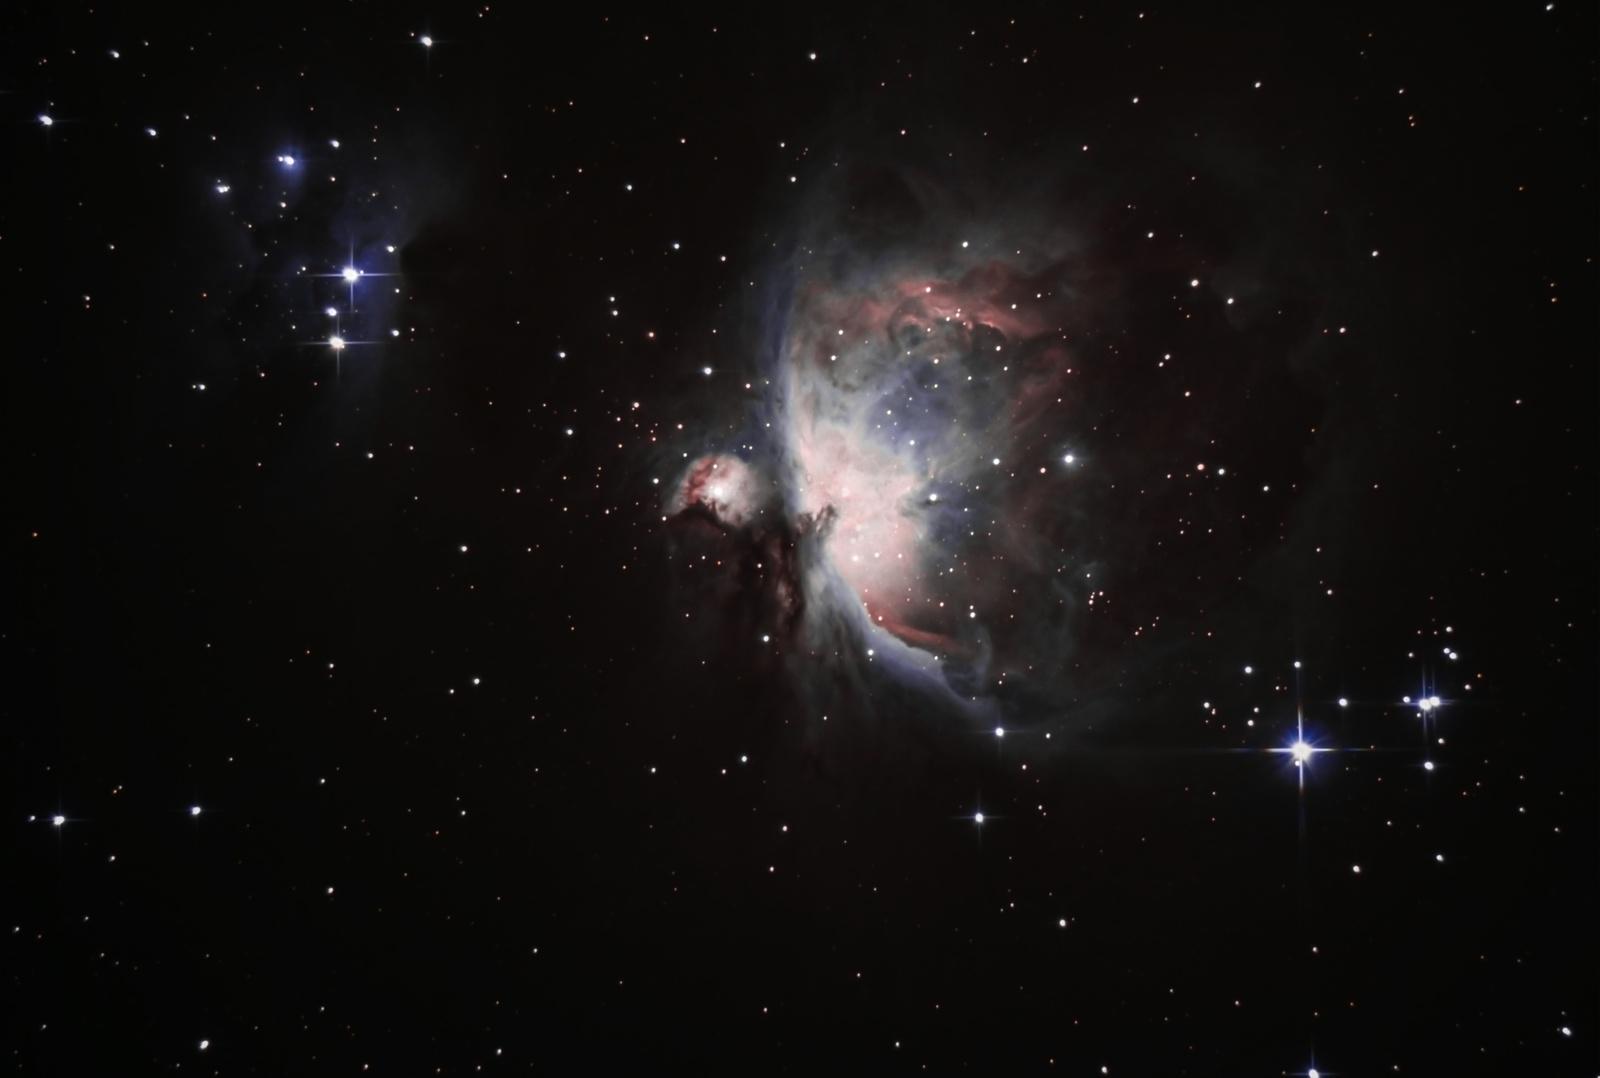 M42_Orion_8_02_2019v2test.thumb.jpg.c56fa2f33859a9a75dad73ffa8dac4c8.jpg